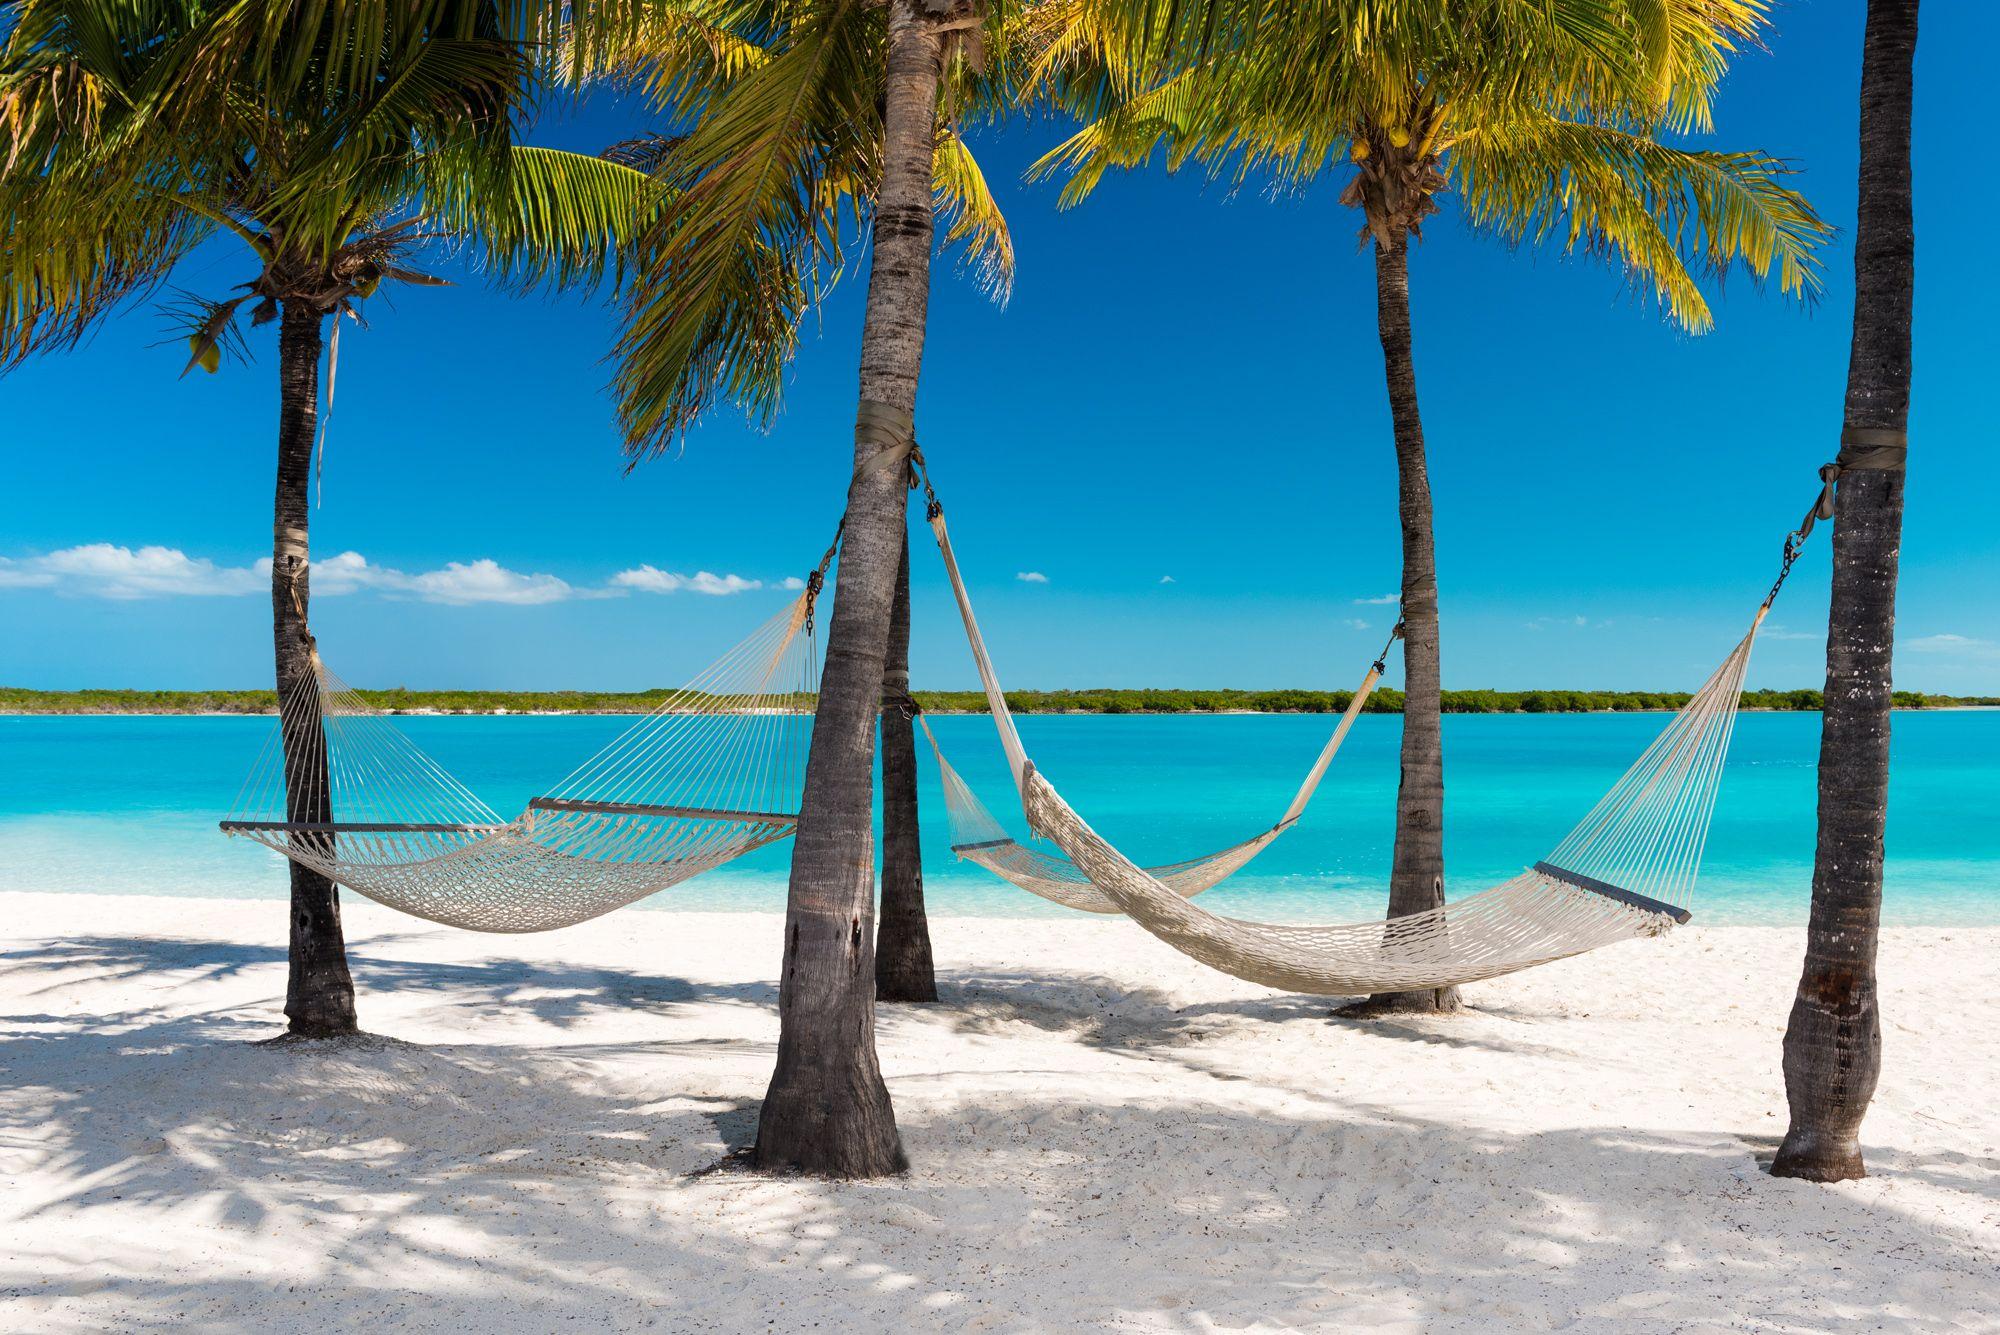 Hammocks on the beach - Beach Blue Haven Resort Hammocks On The